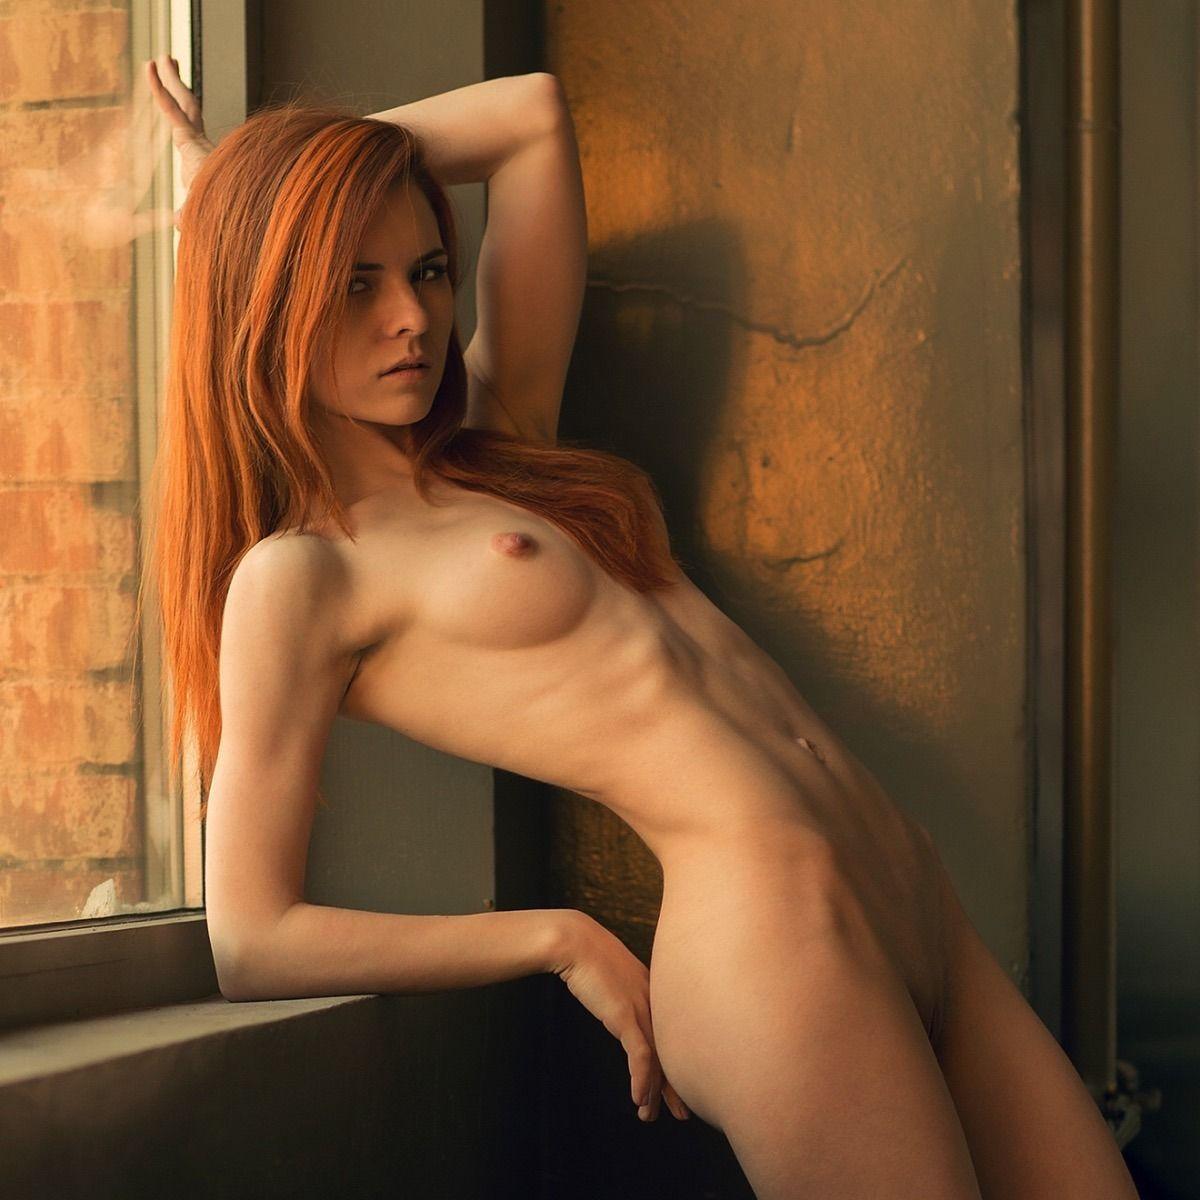 Kindgirls Clean Pictures Galleries Of Nude Girls